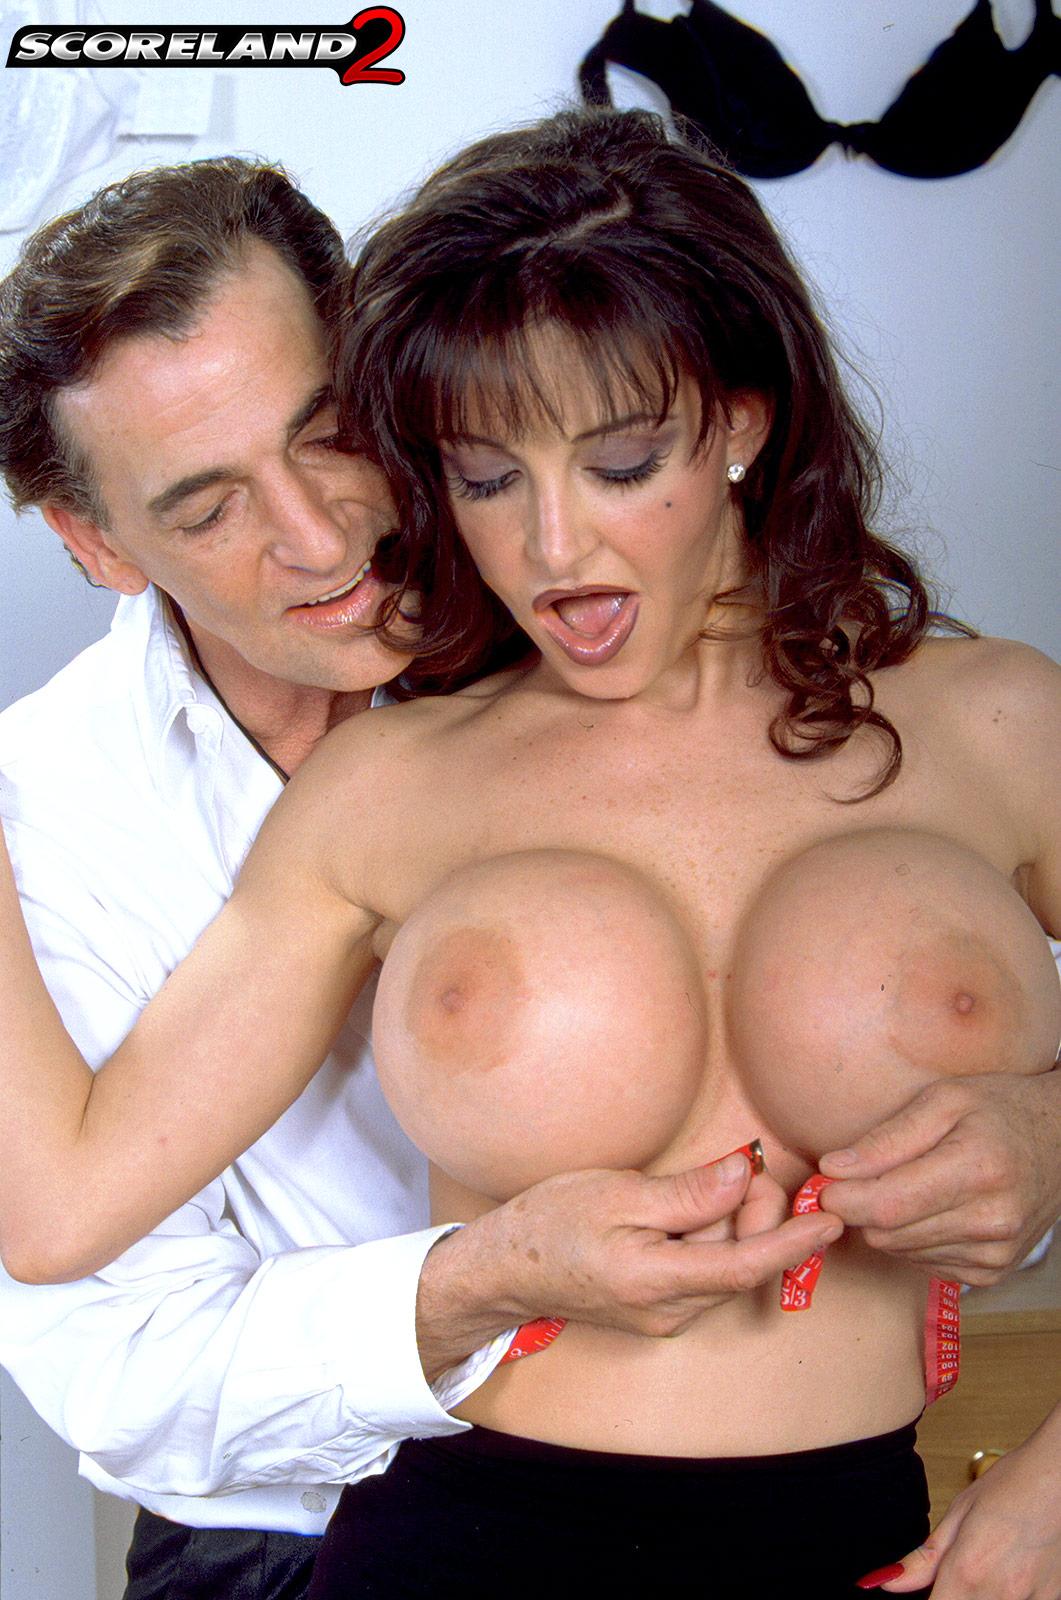 Blowjob Sex And Breast